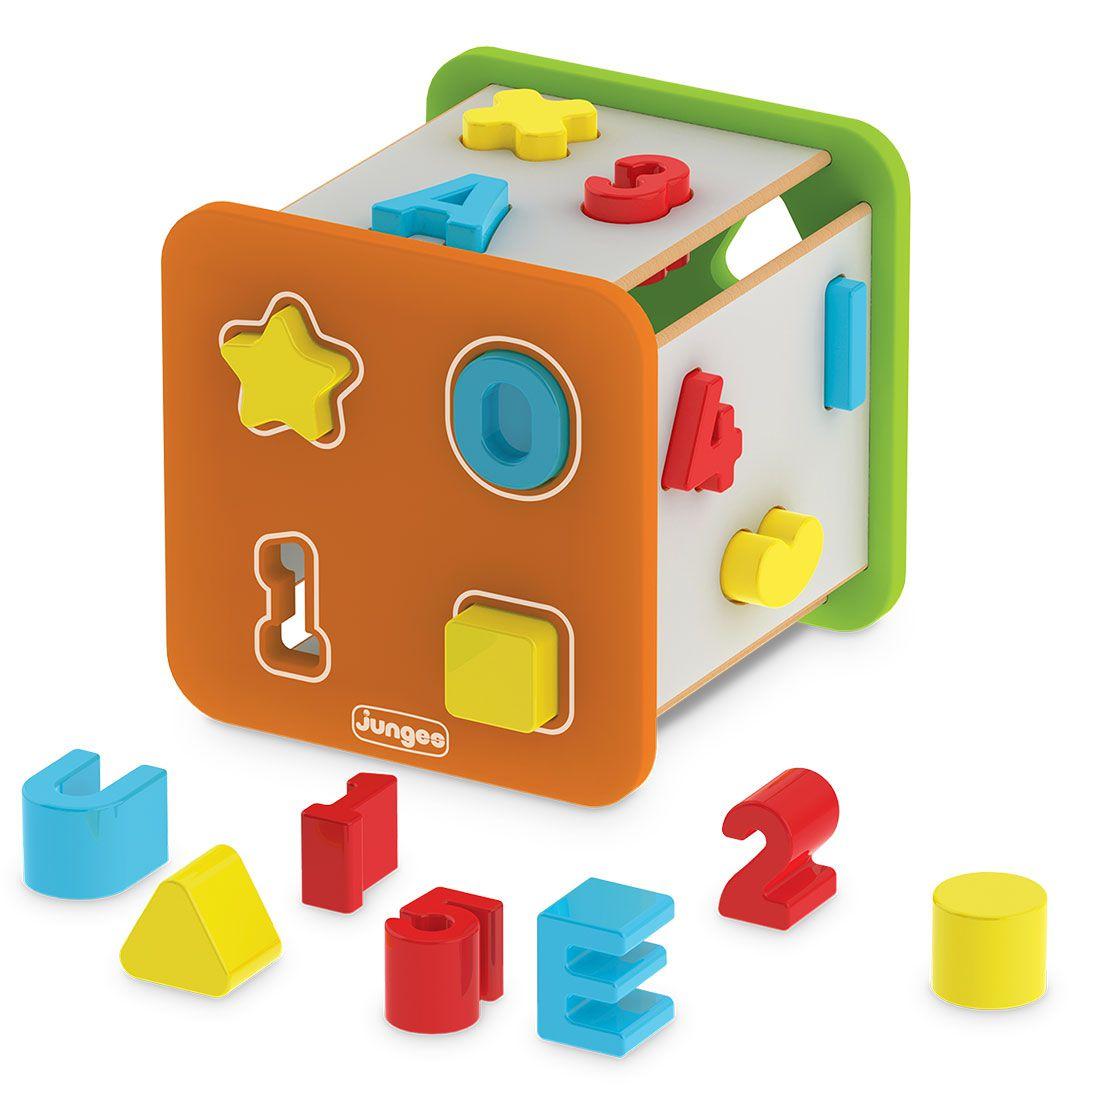 Super Cubo Didático Formas - letras e Números